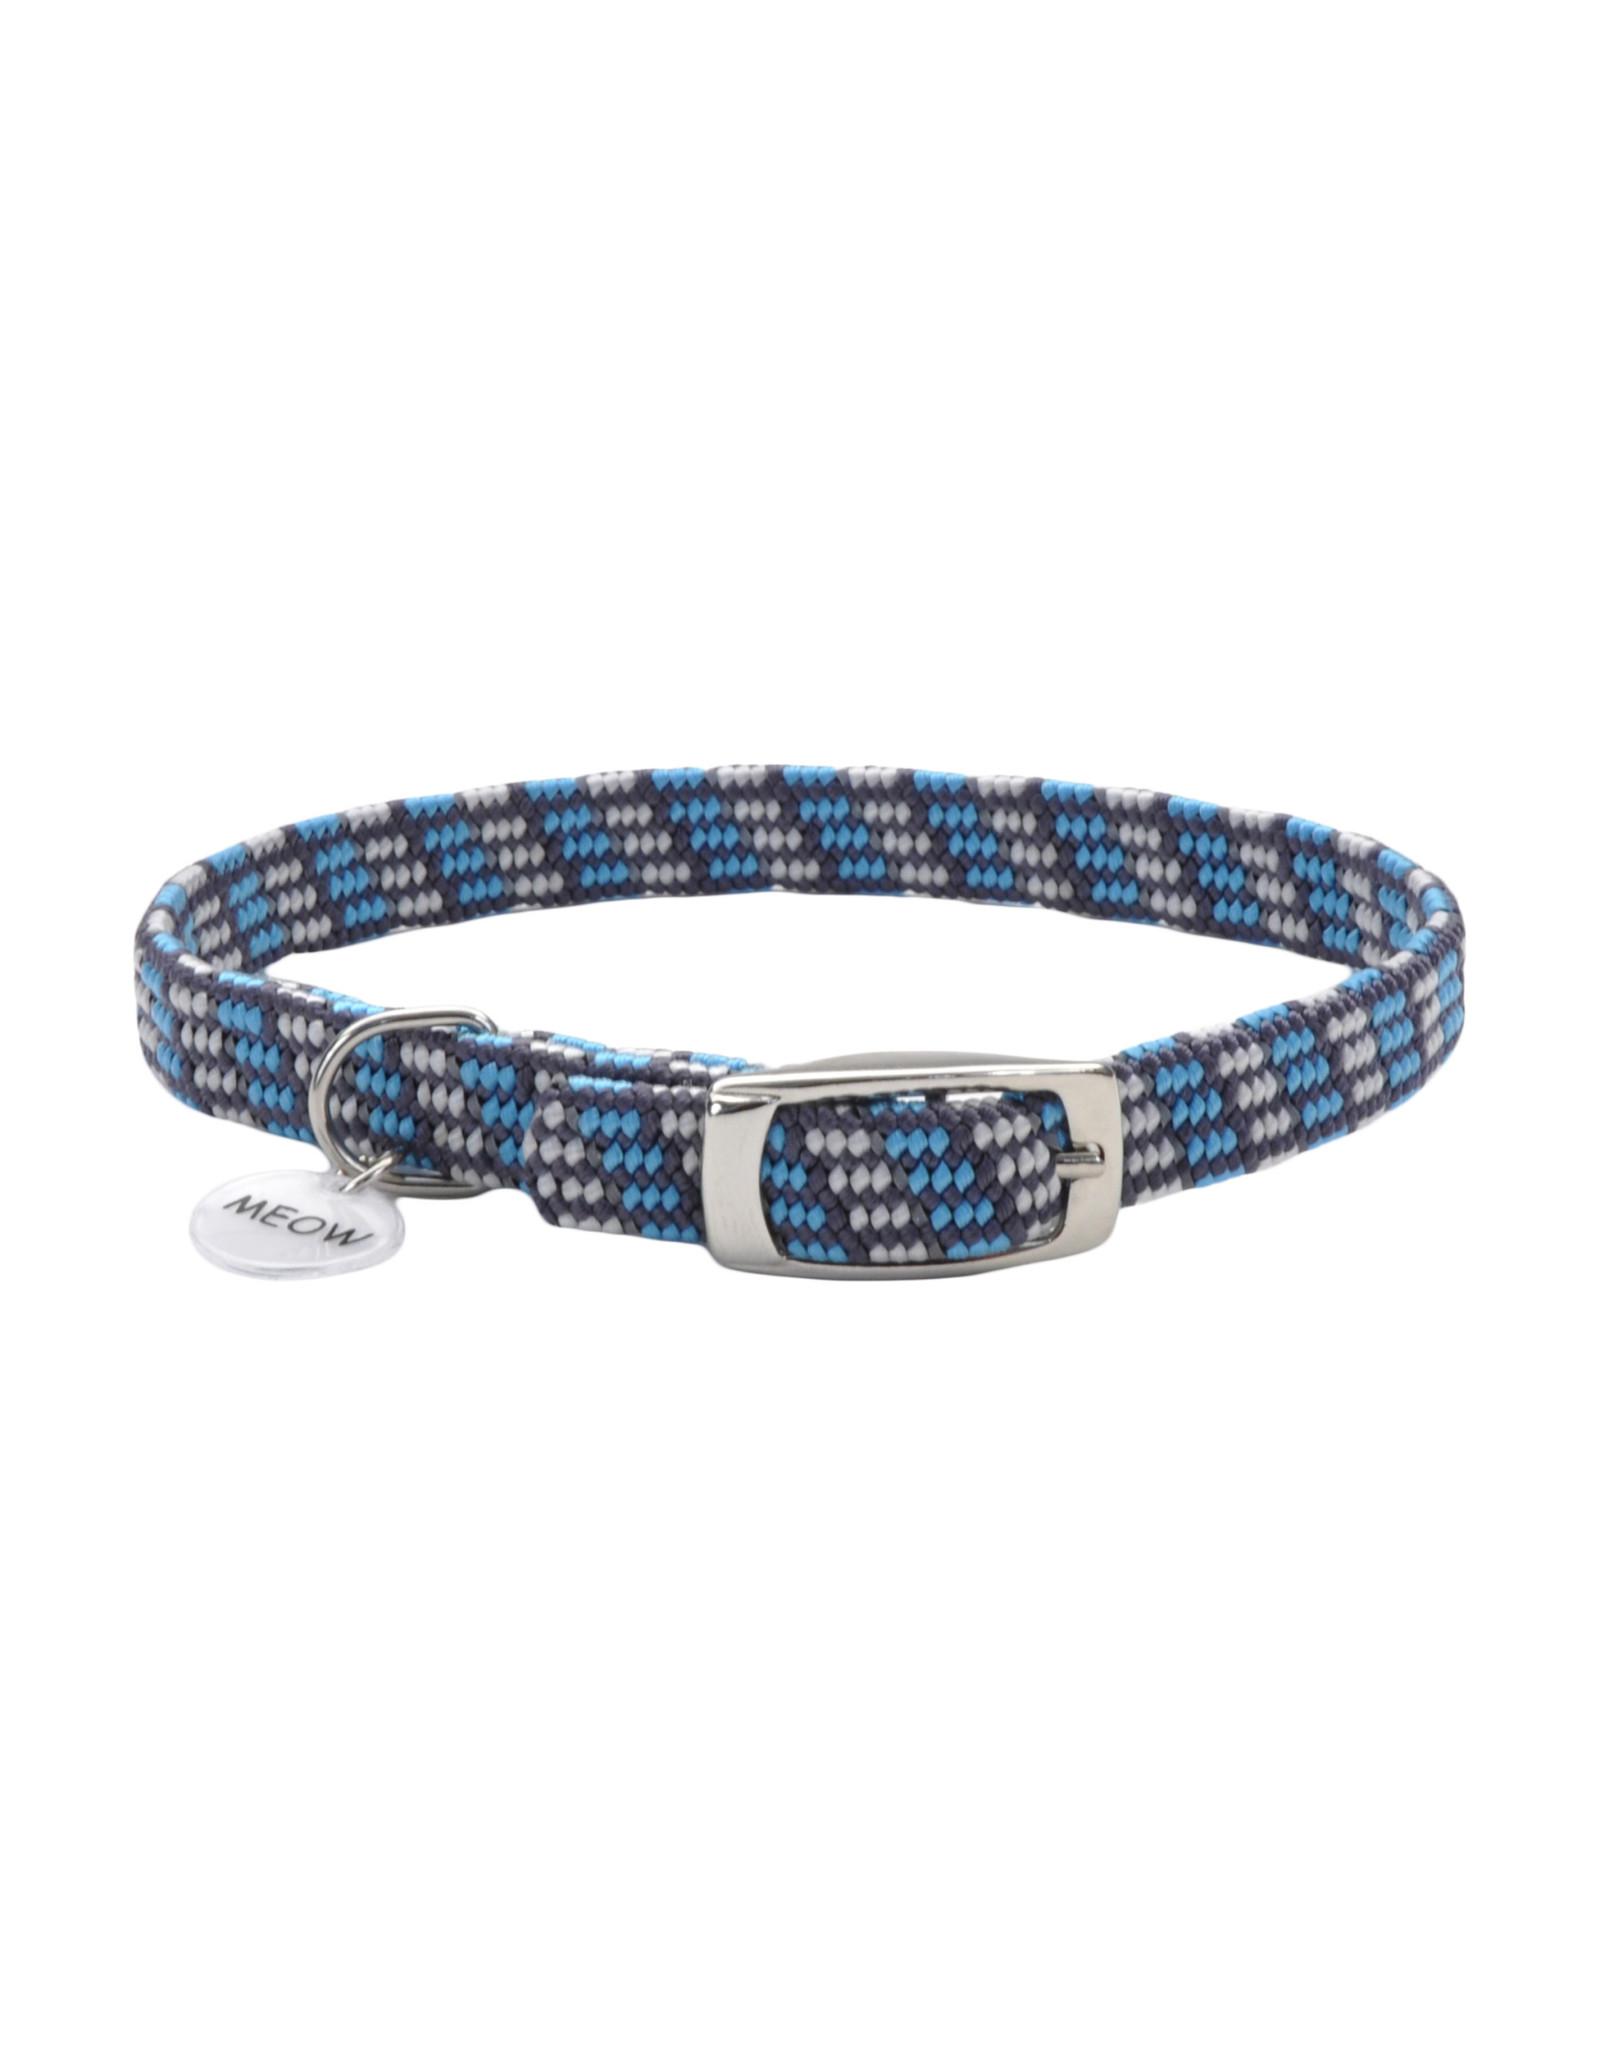 "Coastal Coastal Elasta Cat Reflective/Stretch Collar - 10 "" Grey & Blue"